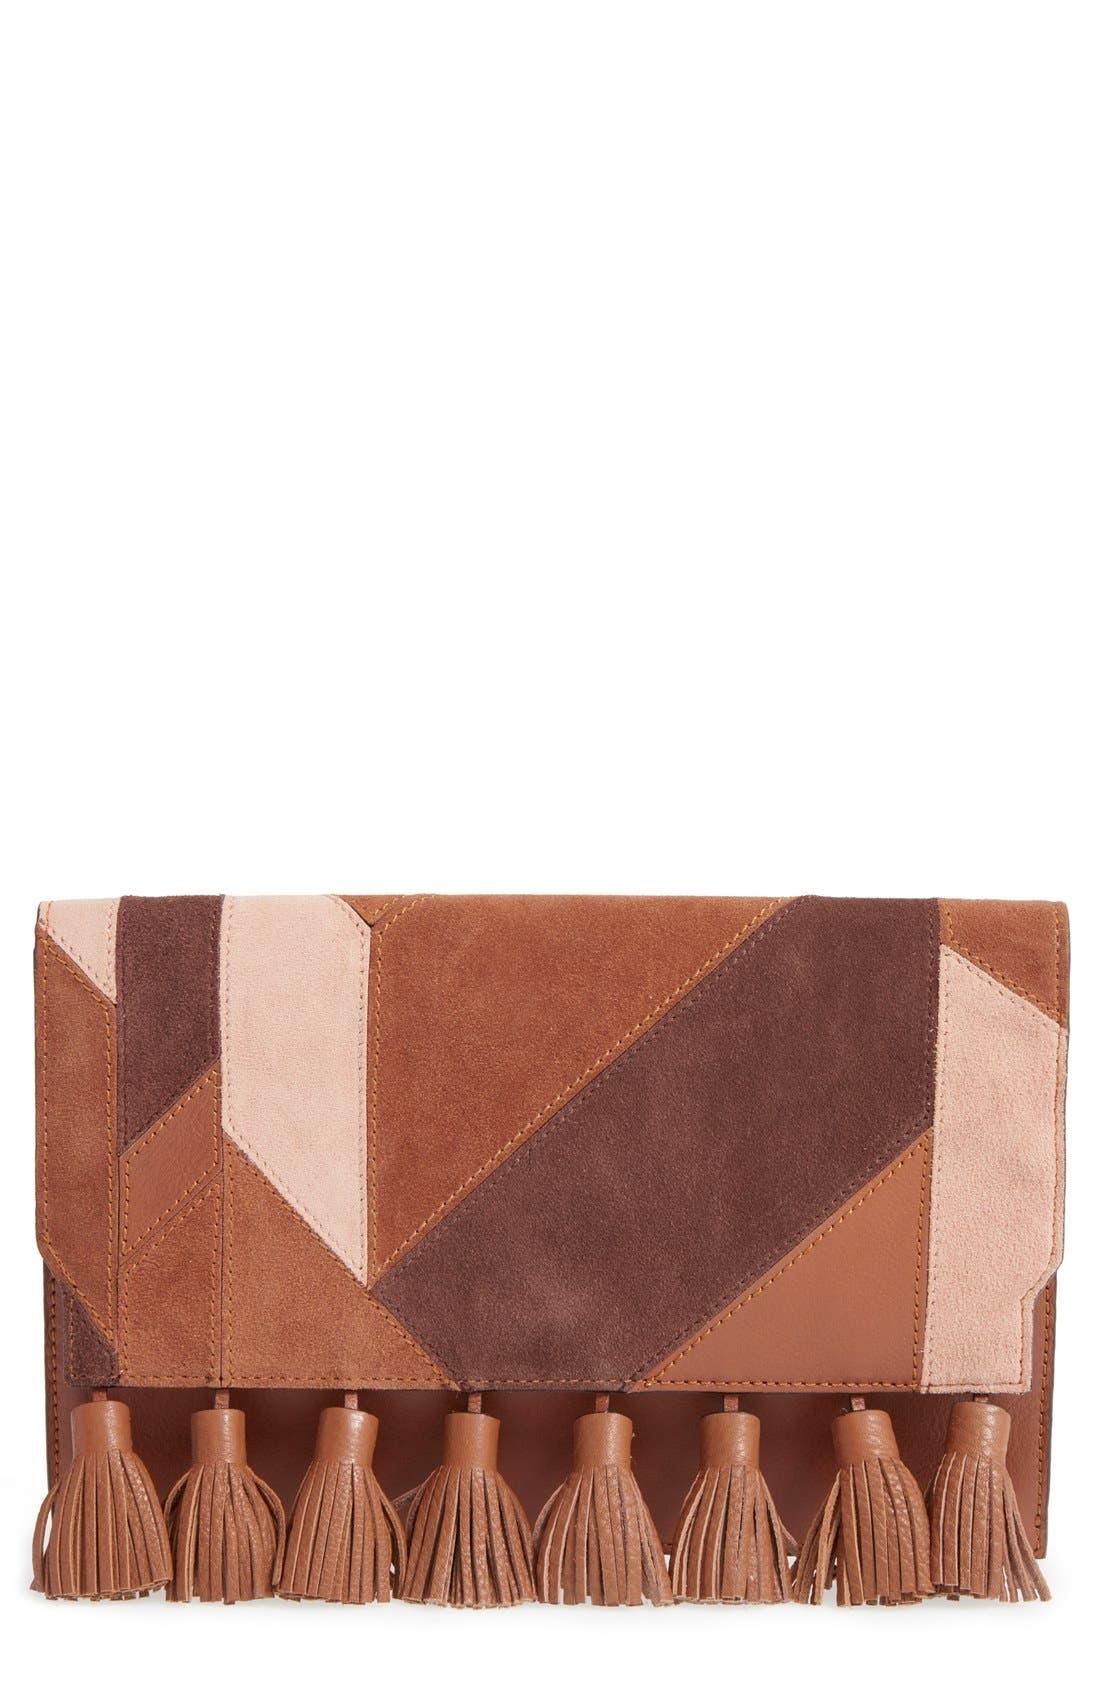 Main Image - Rebecca Minkoff 'Sofia' Tassel Patchwork Leather Clutch